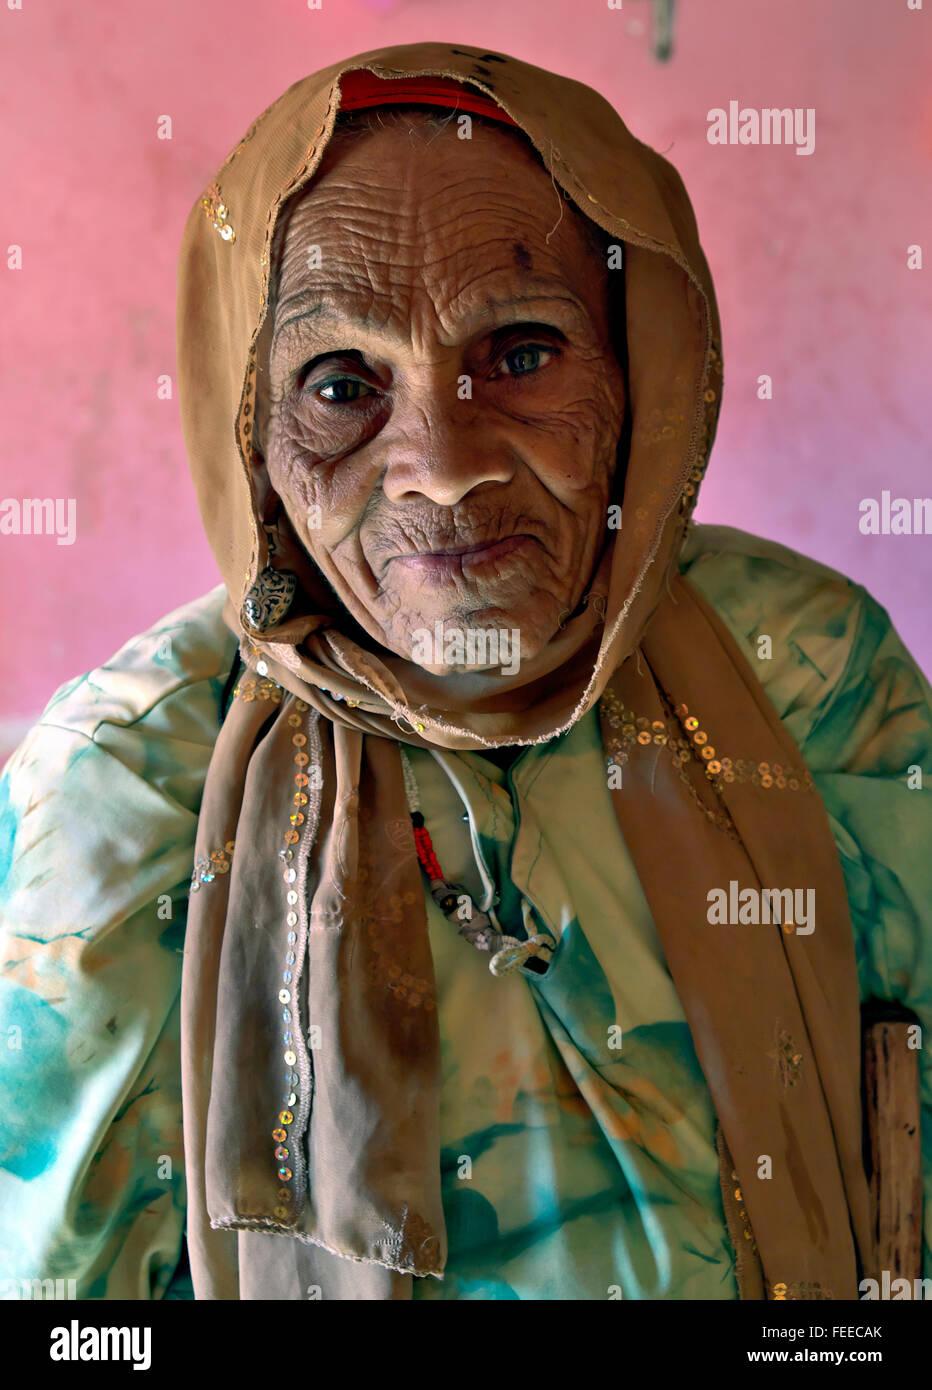 Old woman Berber, 85 years, Aït-Ben-Haddou, Ksar, Souss-Massa-Draa Region, Morocco - Stock Image